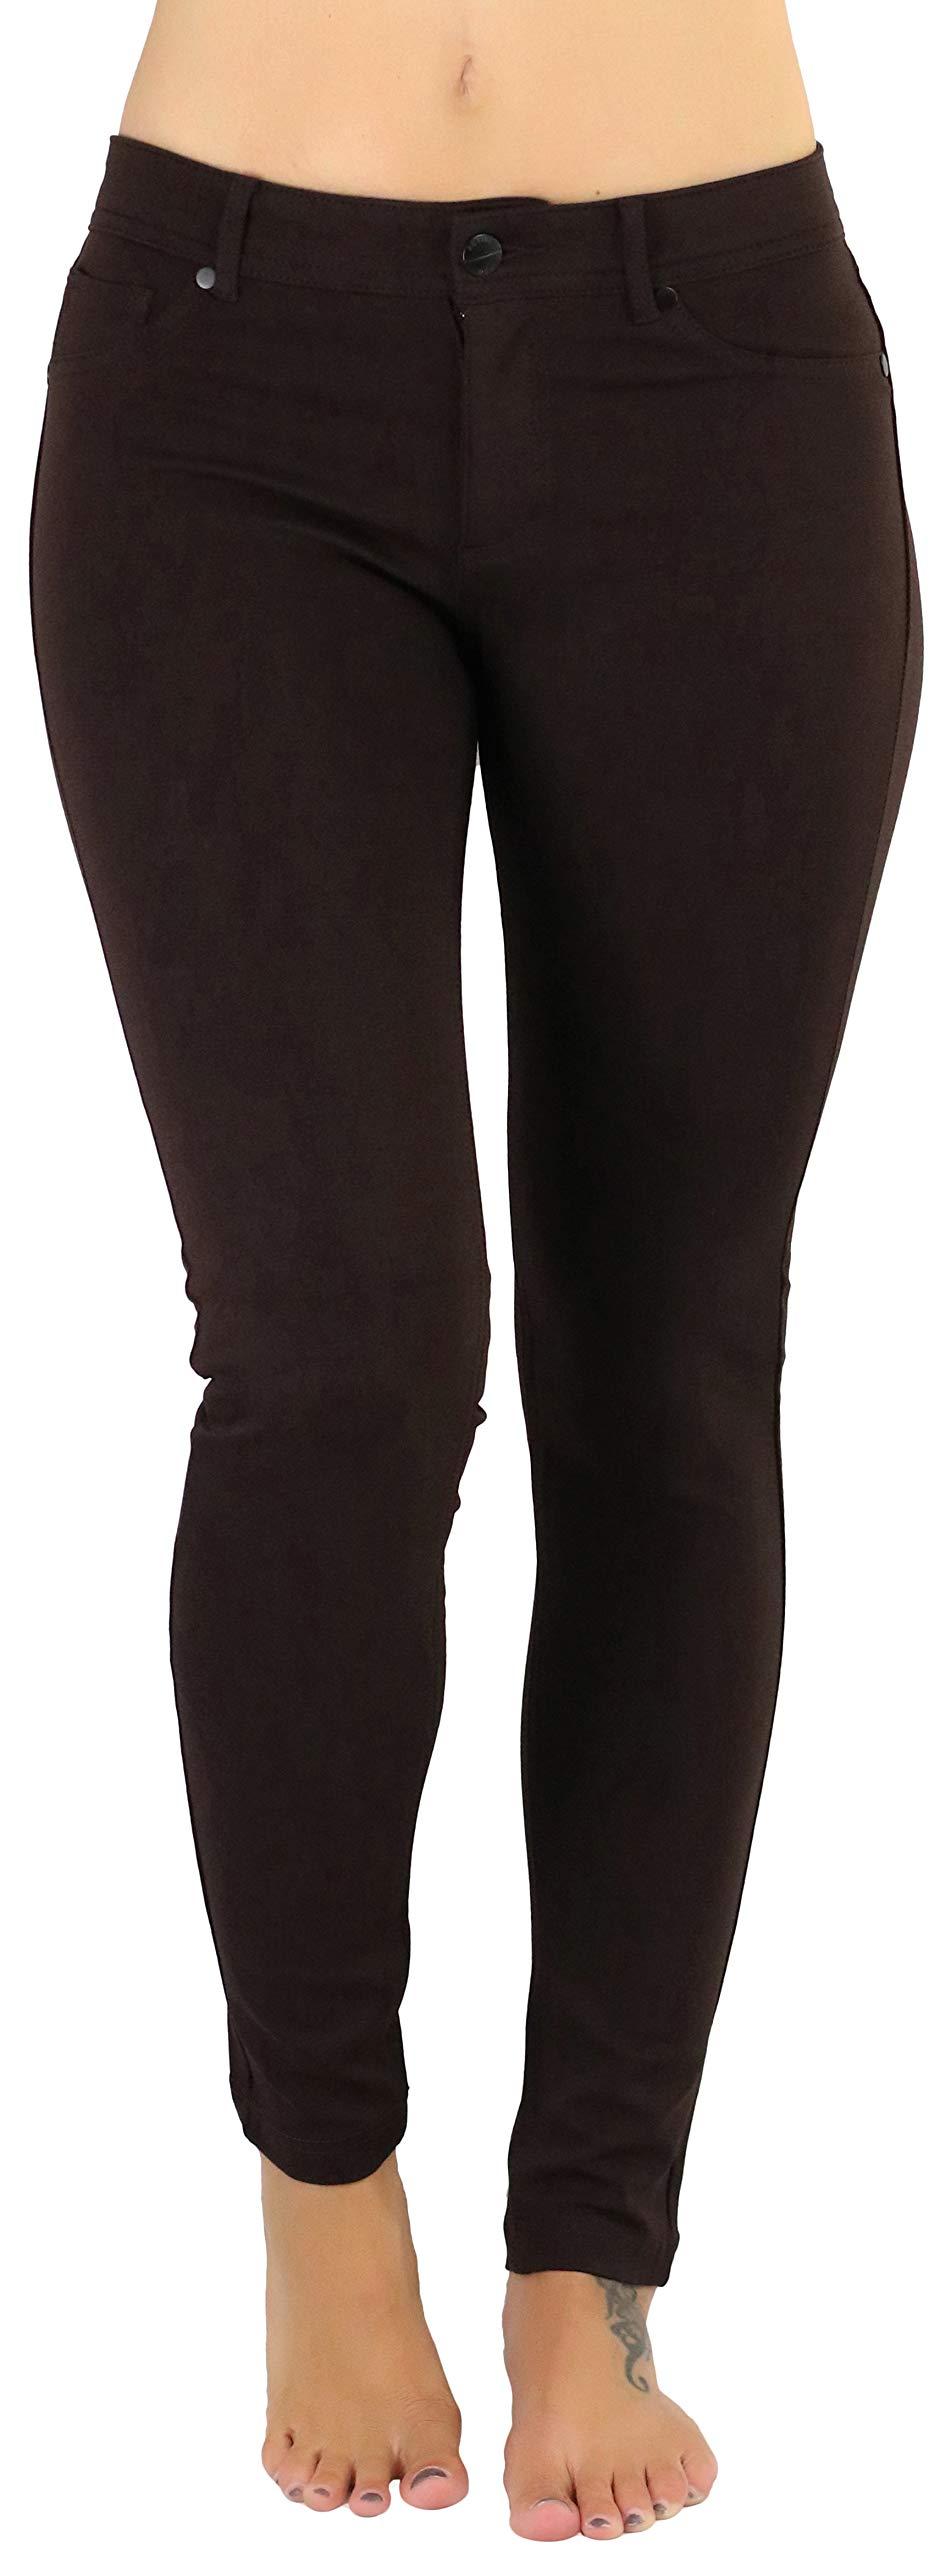 ToBeInStyle Women's 5-Pocket Skinny Fit Ponte Pants - New Brown - Large